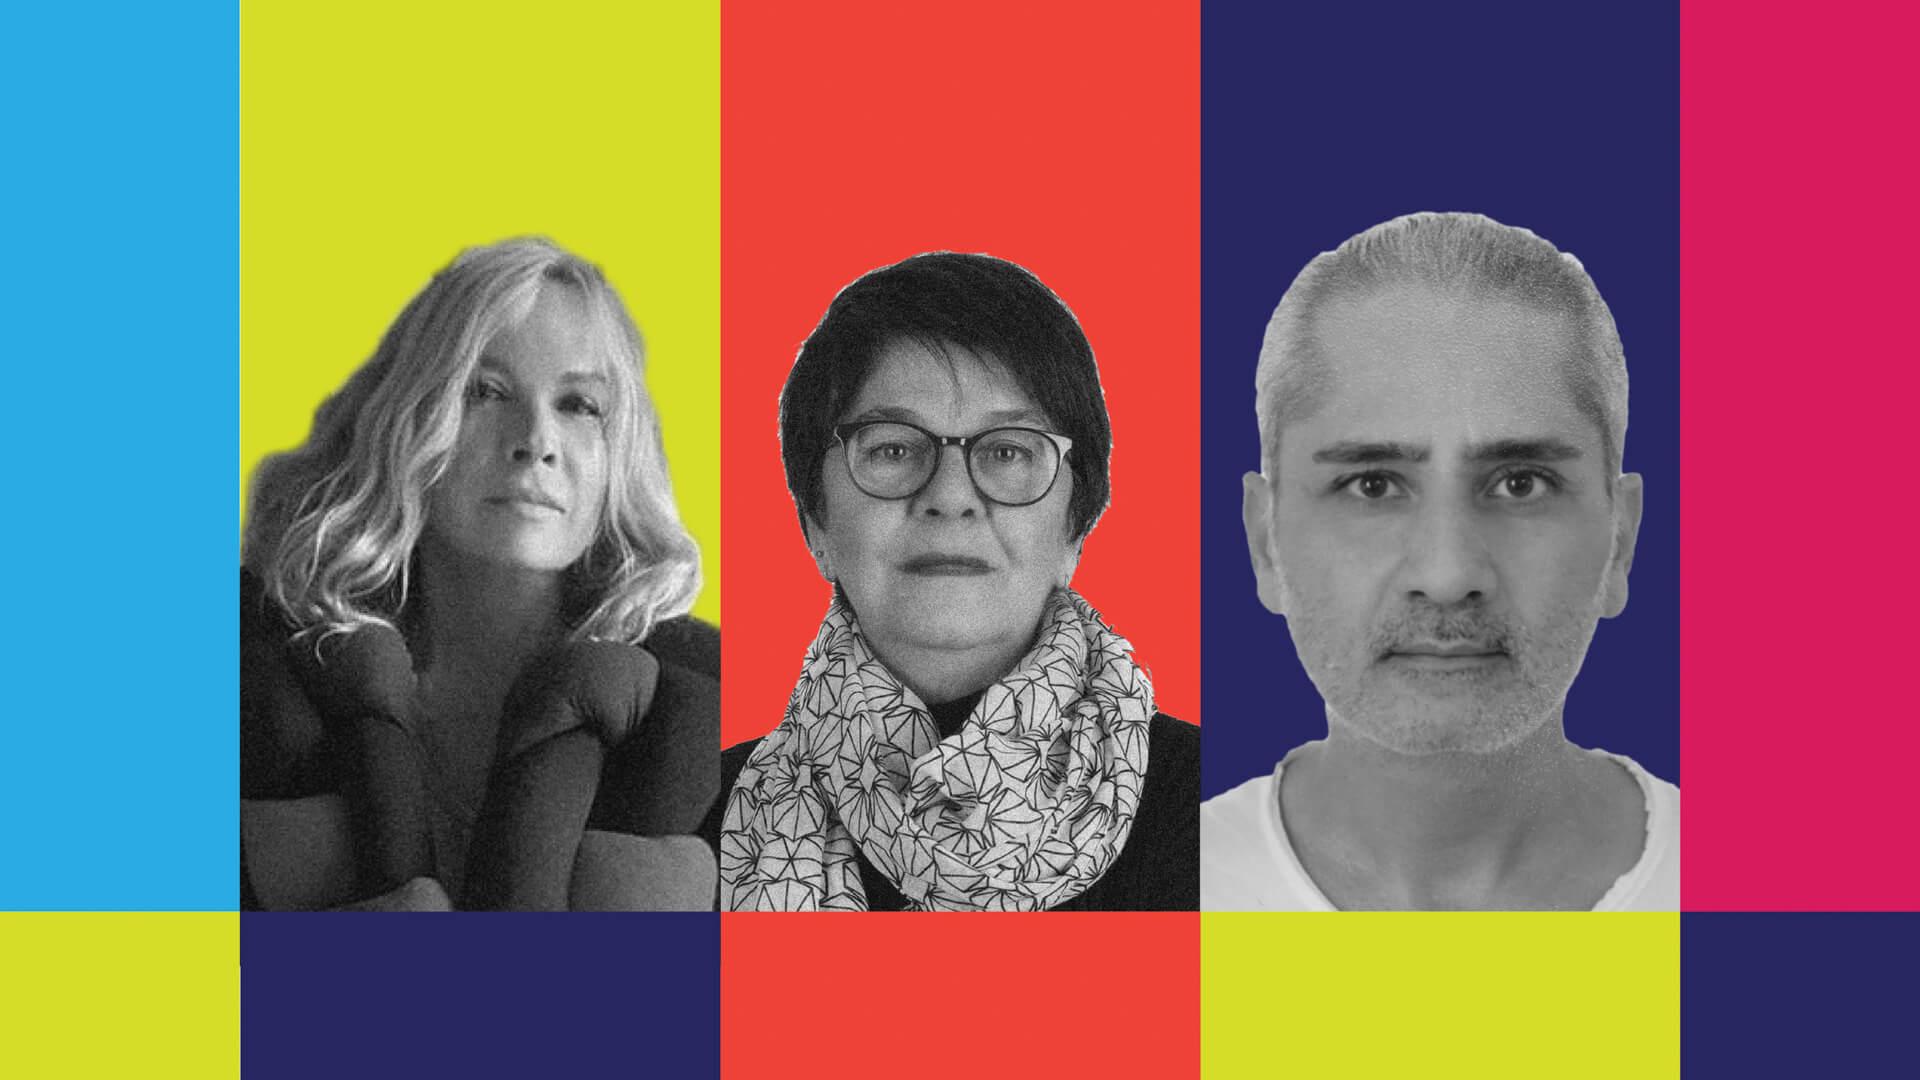 Design, Designer and Fashion: The Past, The Present and The Future <br> Müşerref Zeytinoğlu, Nihal Müge Kaplangı, Kami Ermirhan